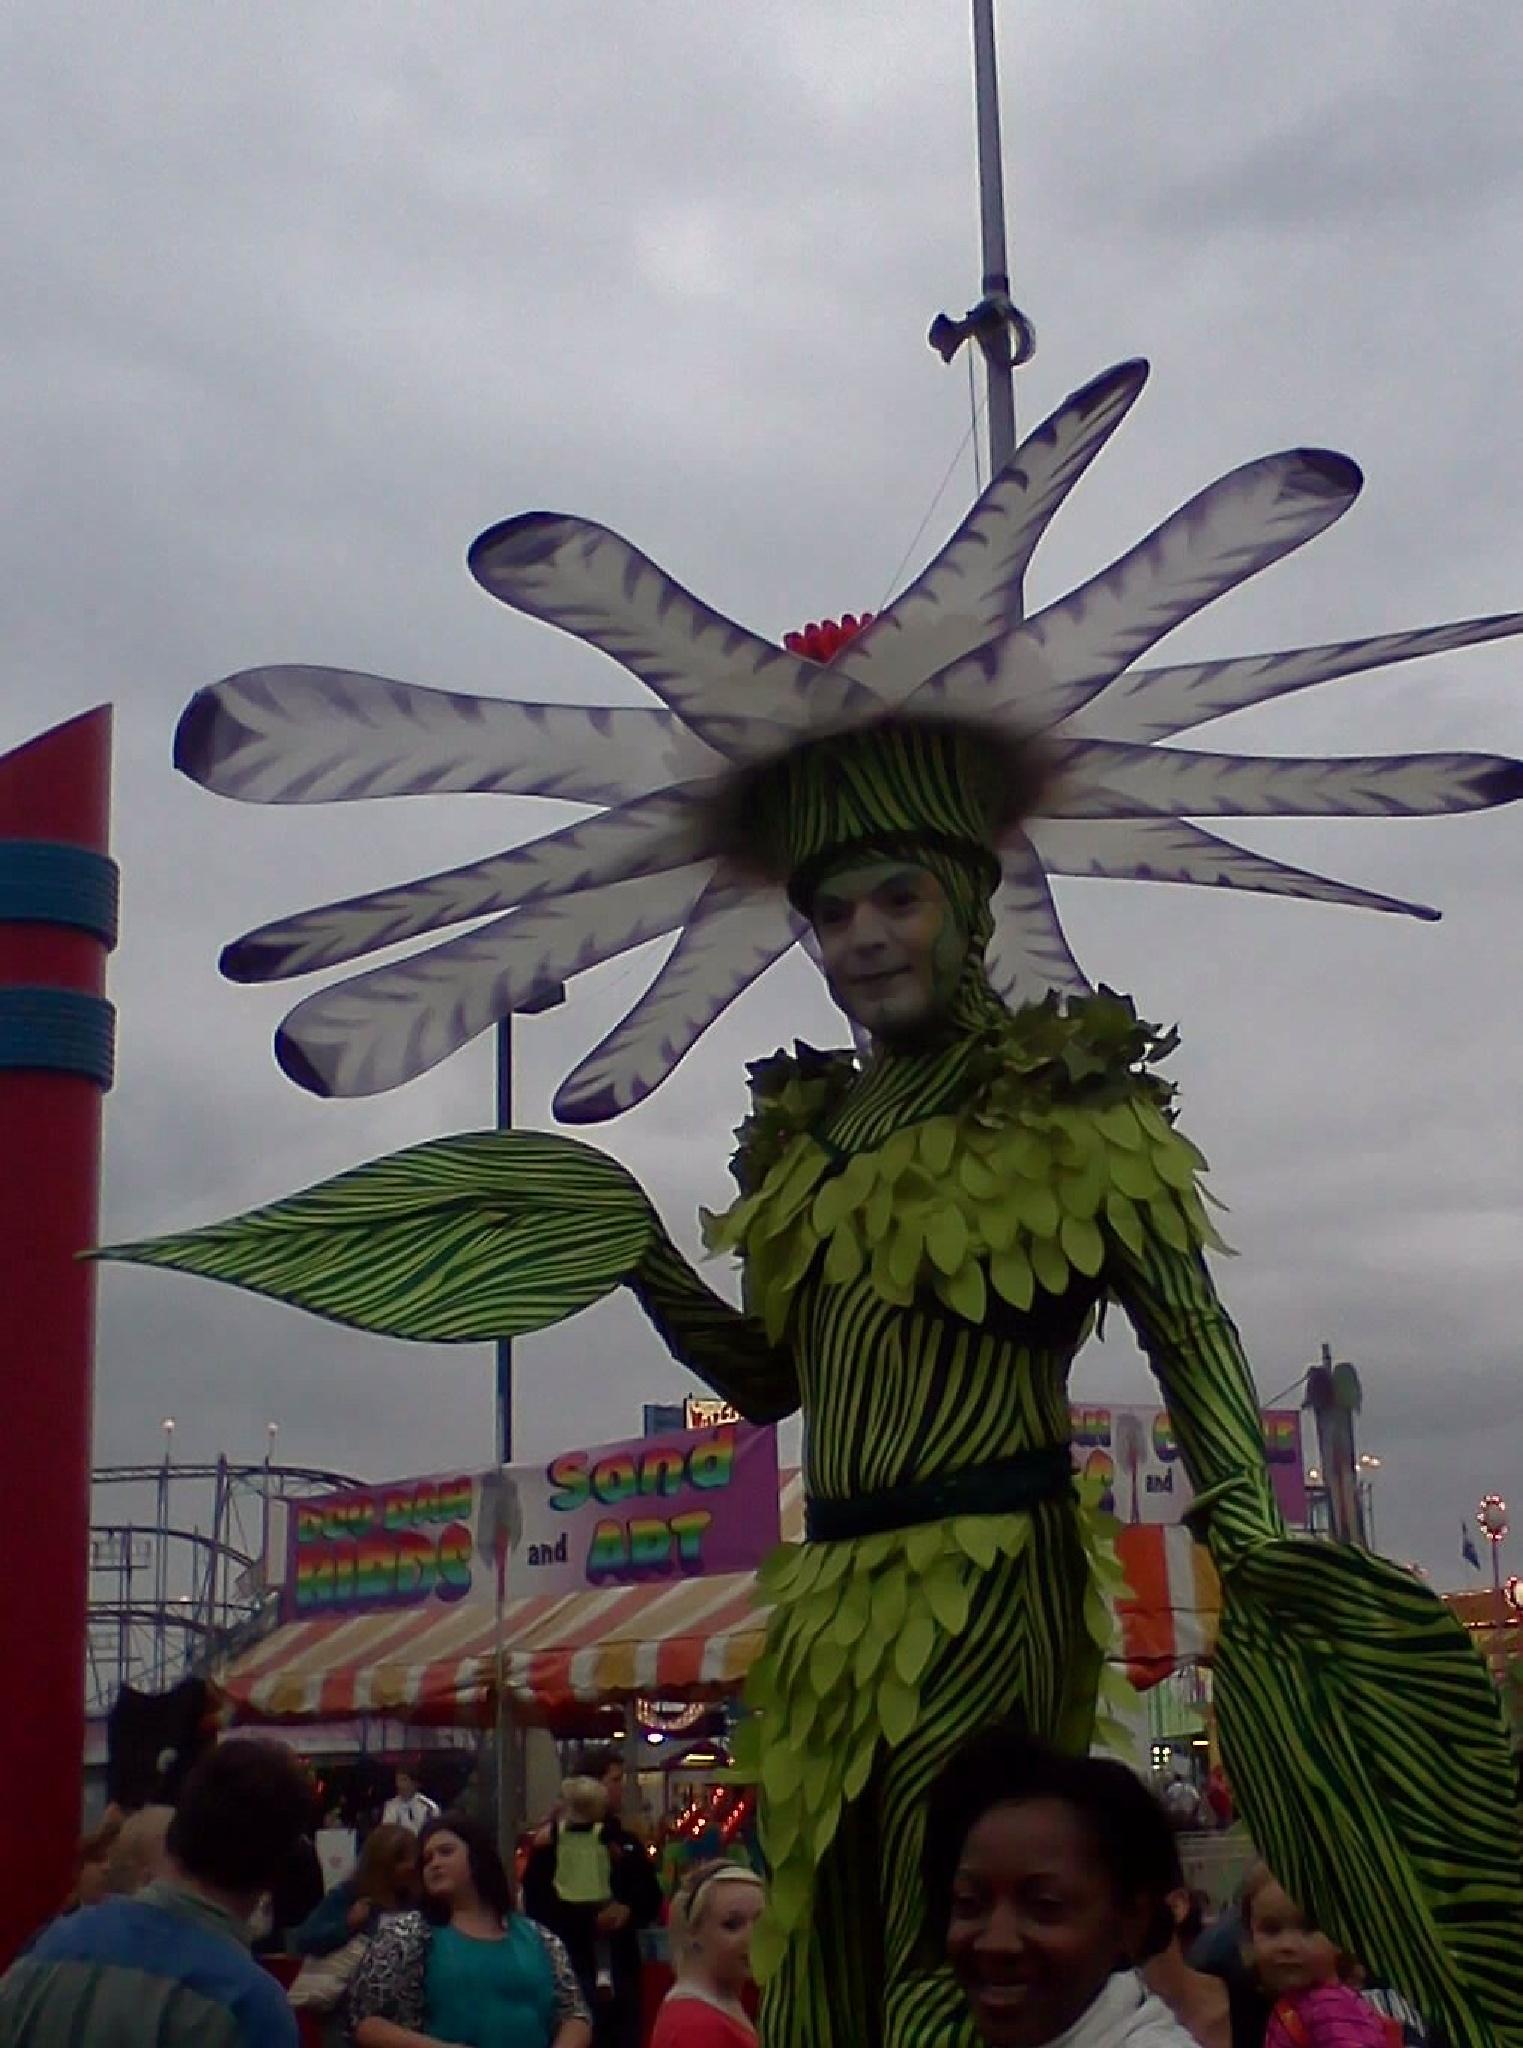 Day at the Fair by tessa33